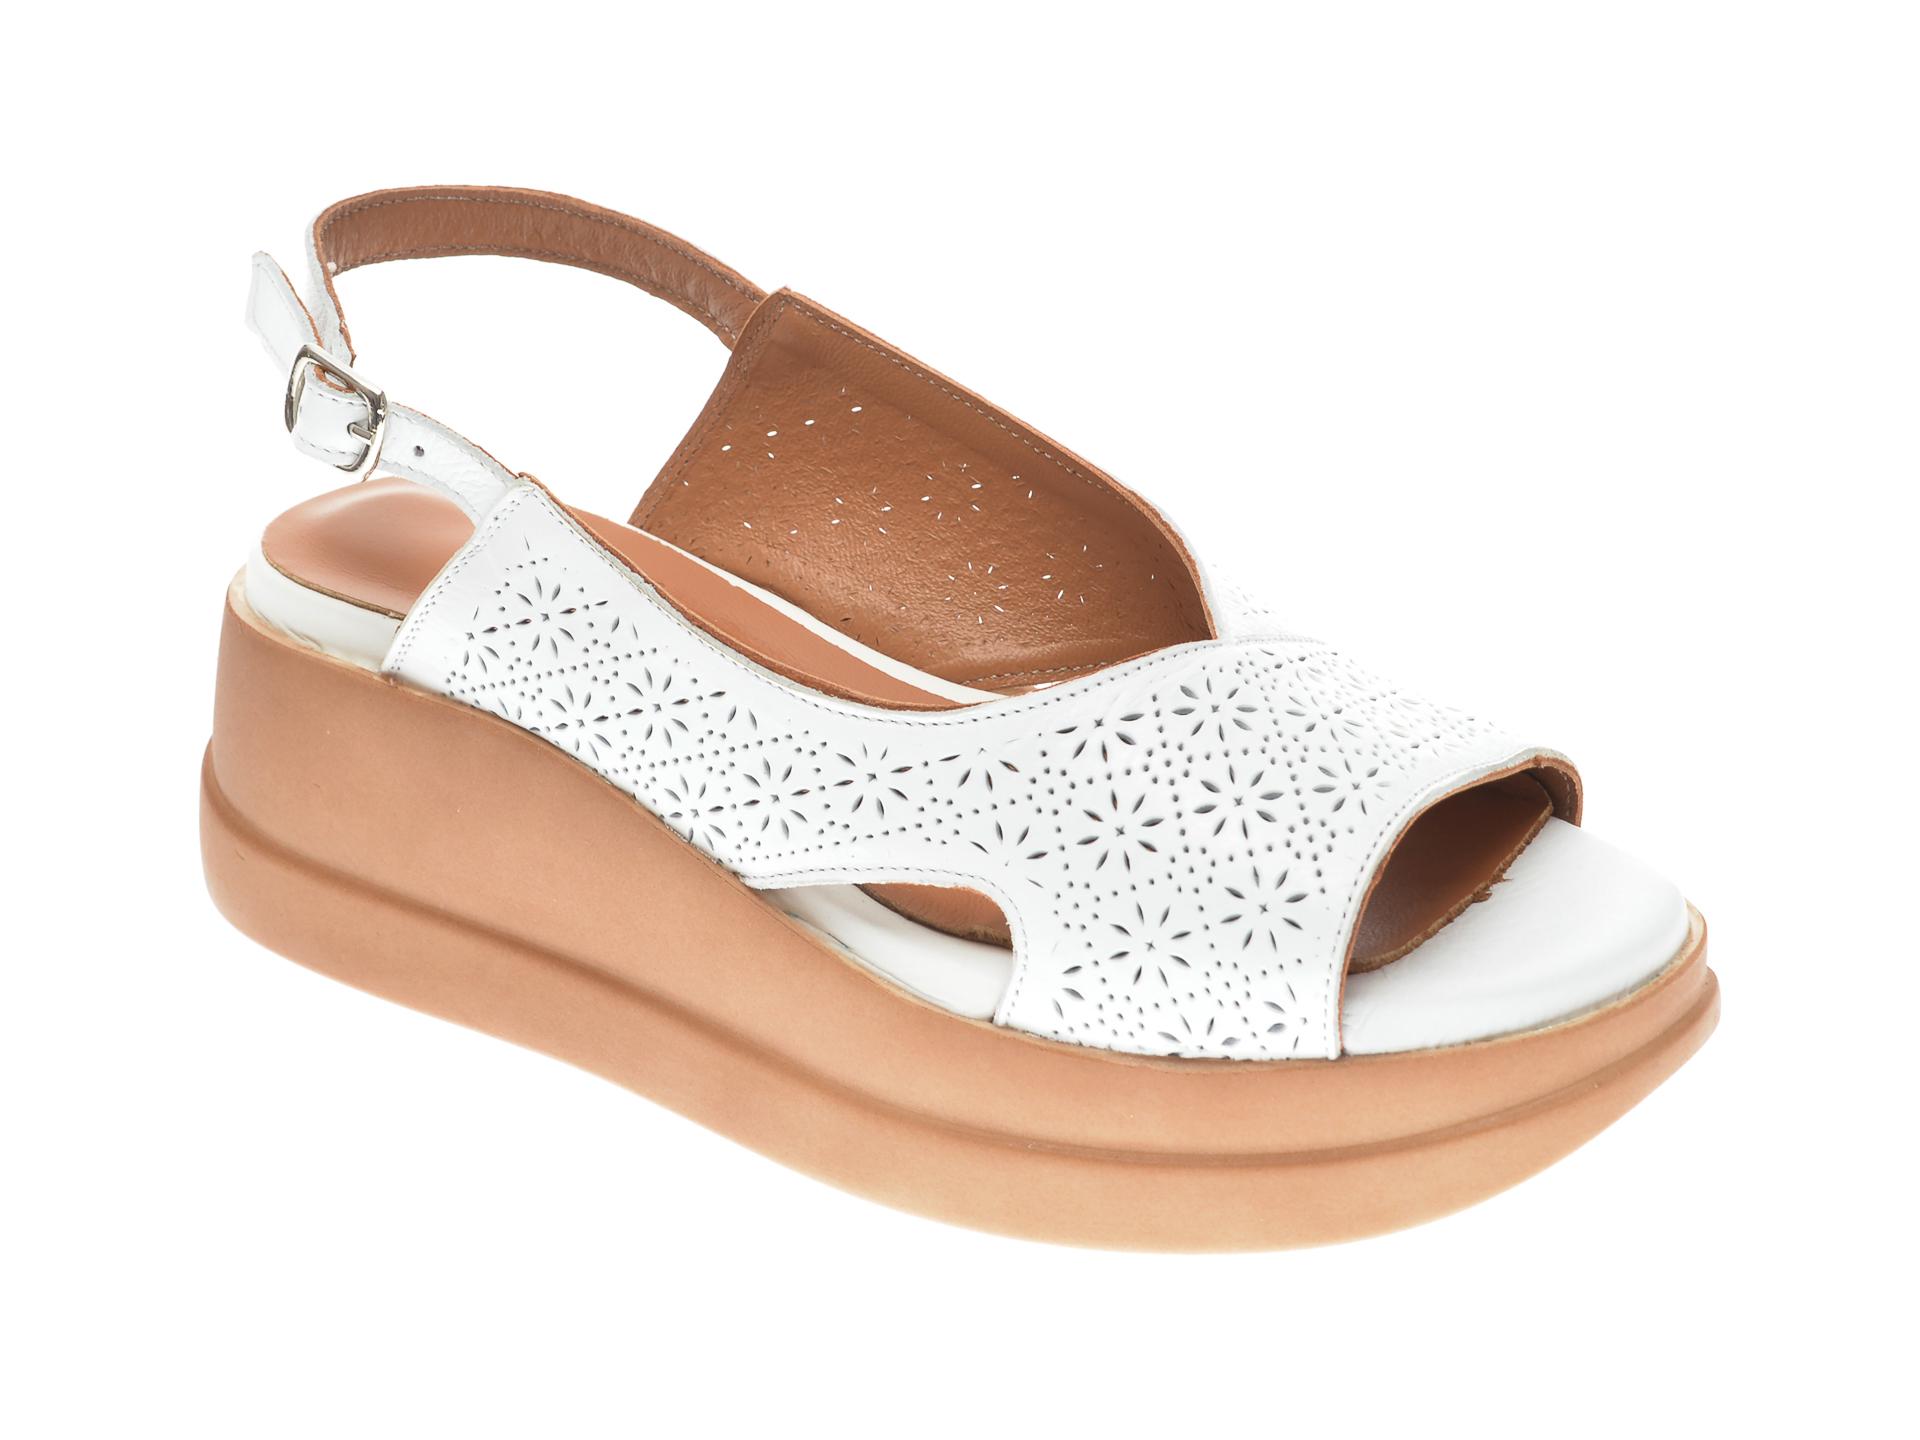 Sandale FLAVIA PASSINI albe, 20405, din piele naturala New